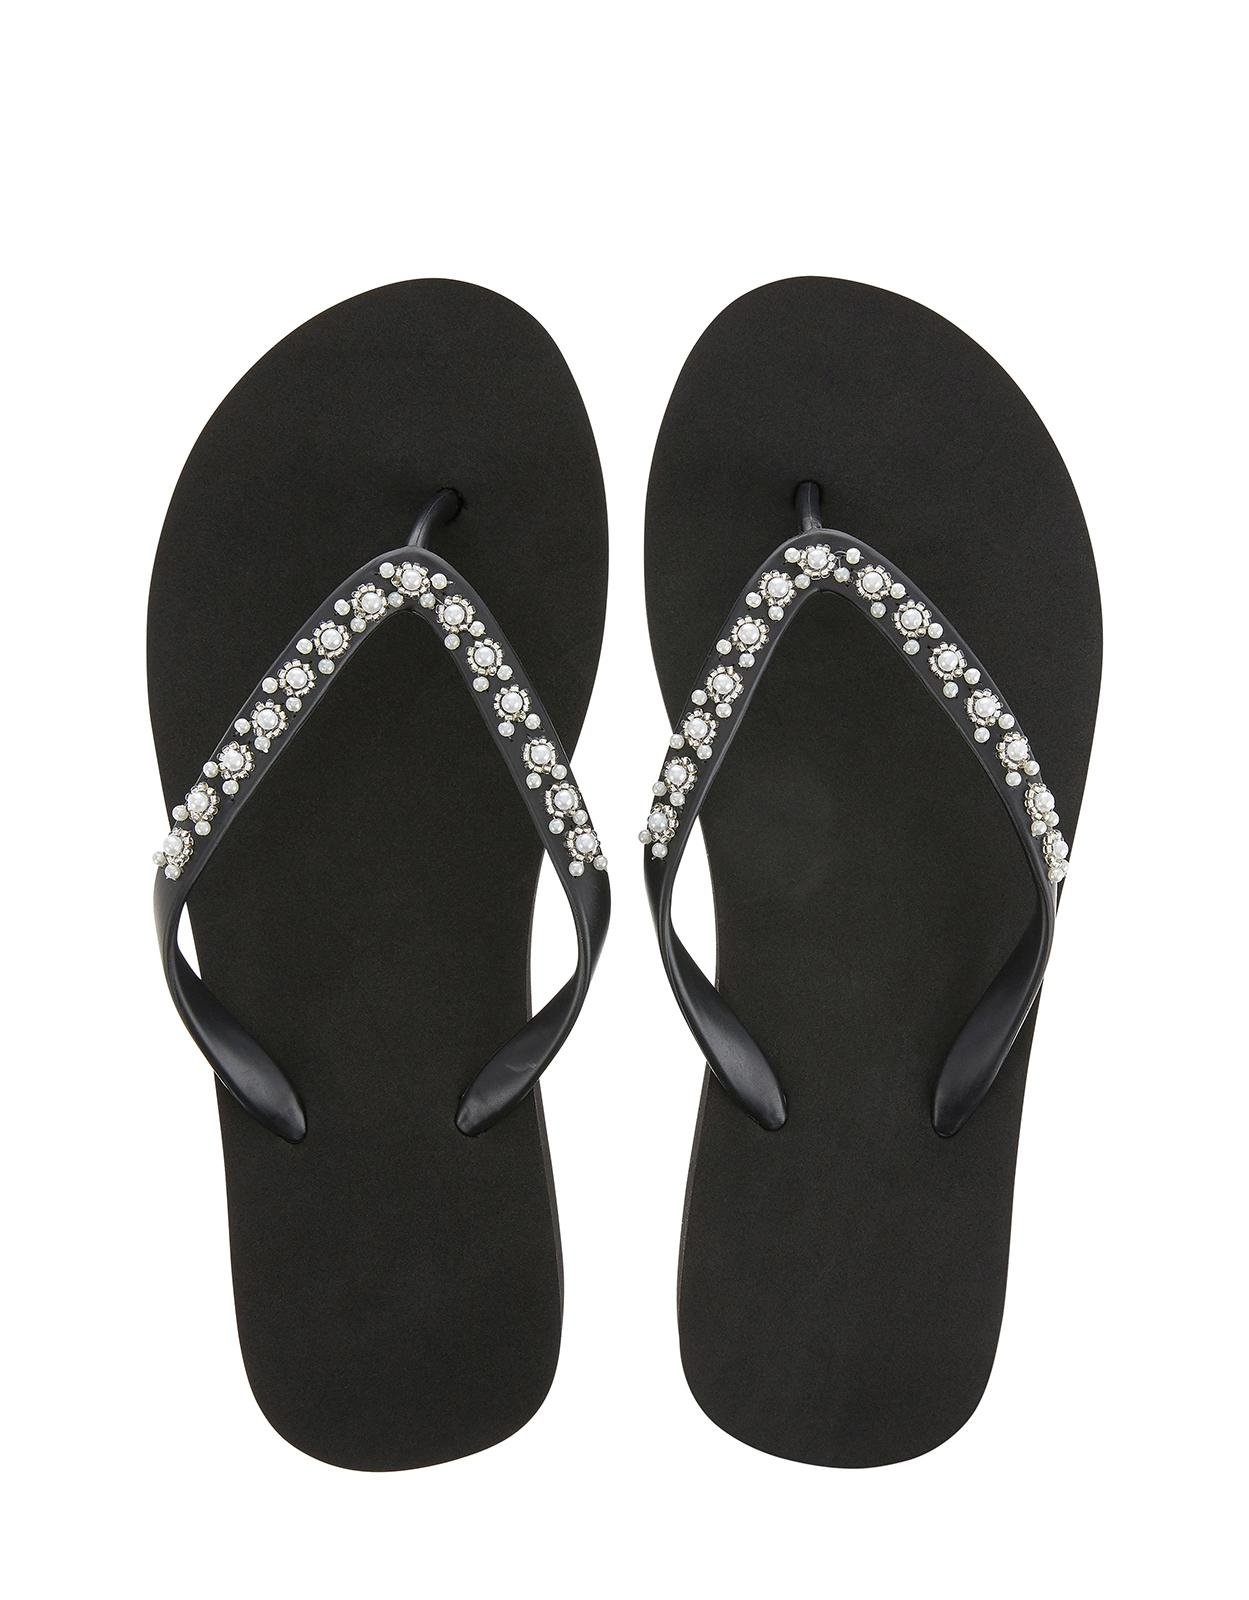 052d18c0d3902 Accessorize Marbella Wedge Eva Flip Flops in Black - Lyst